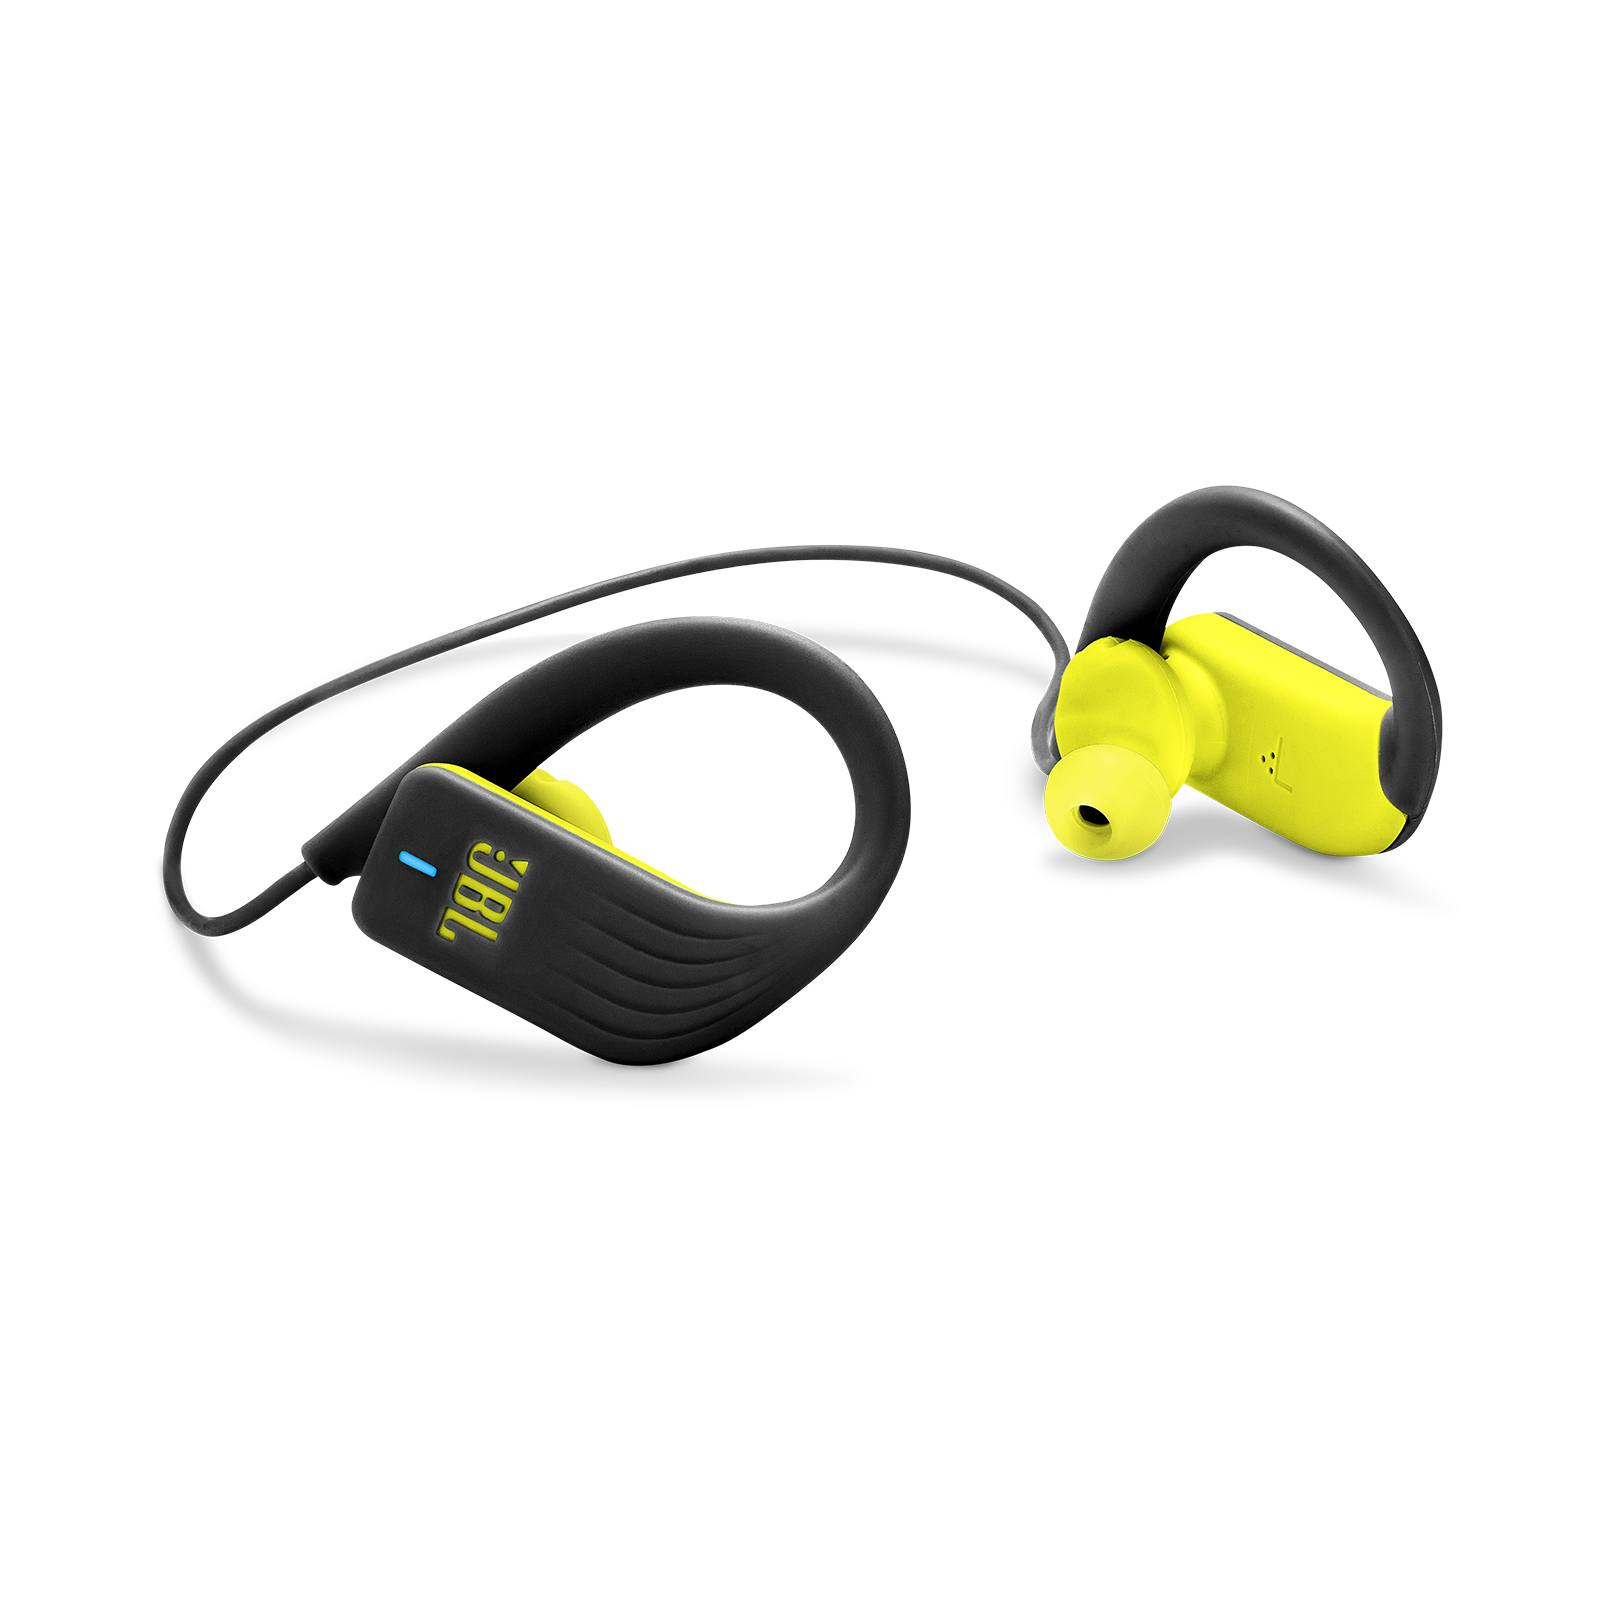 Fone de Ouvido Bluetooth JBL Endurance Sprint - Preto JBLENDURSPRINTBNL